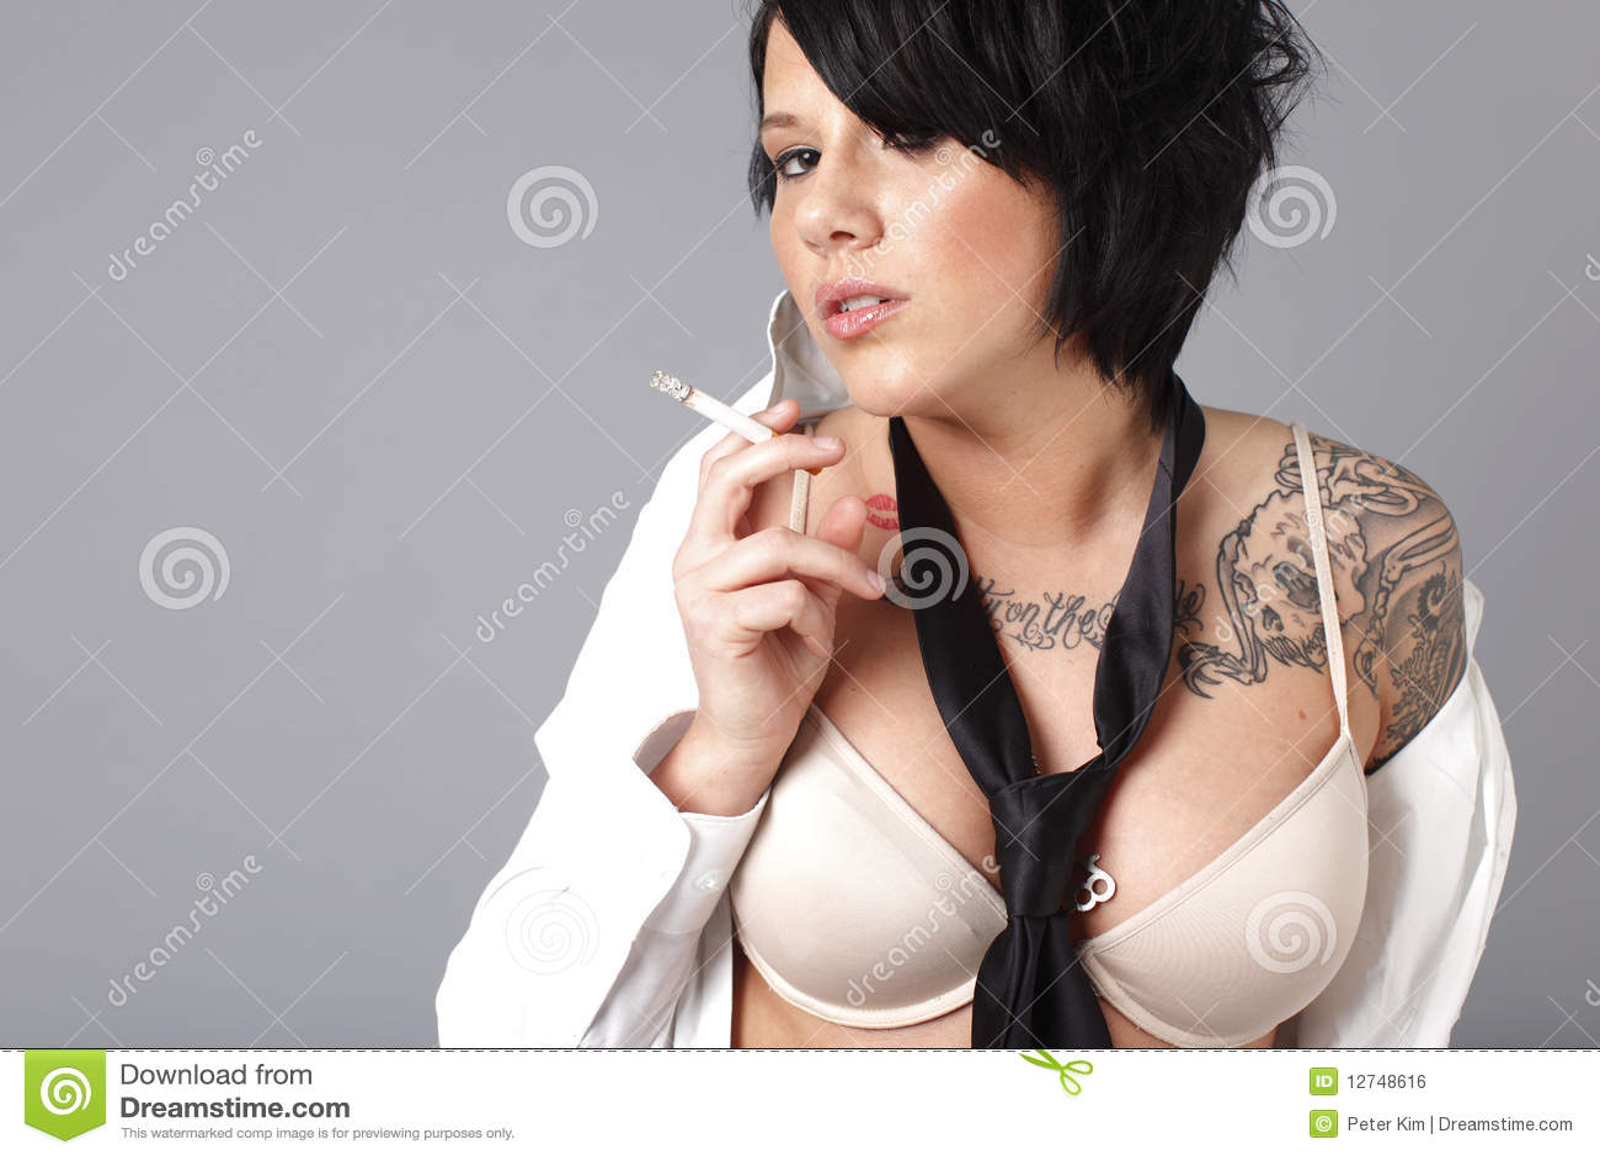 Cigarette sexy smoker smoking woman